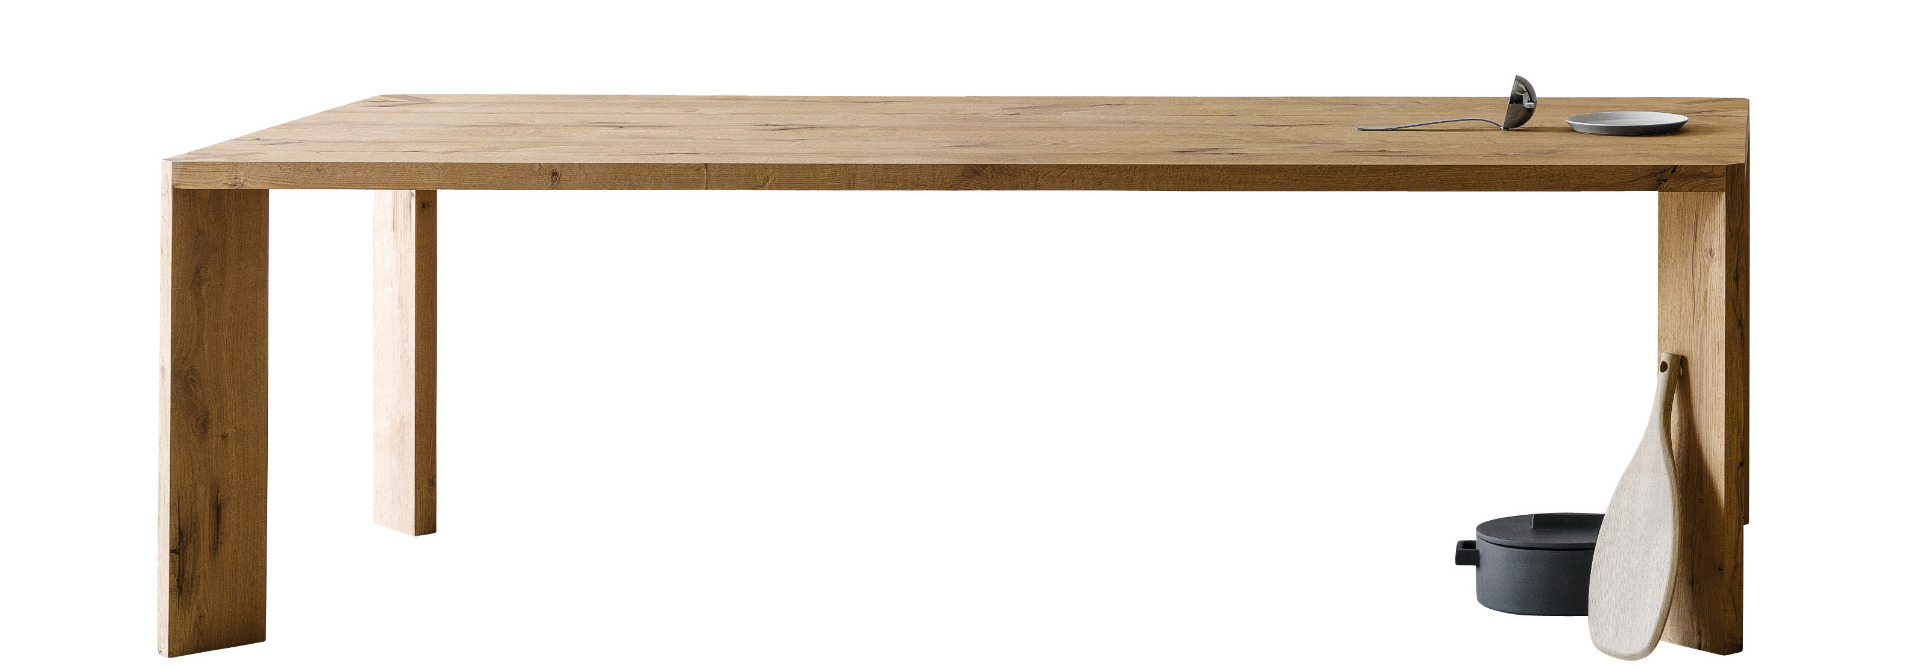 Miniforms Manero Table Wood Frame